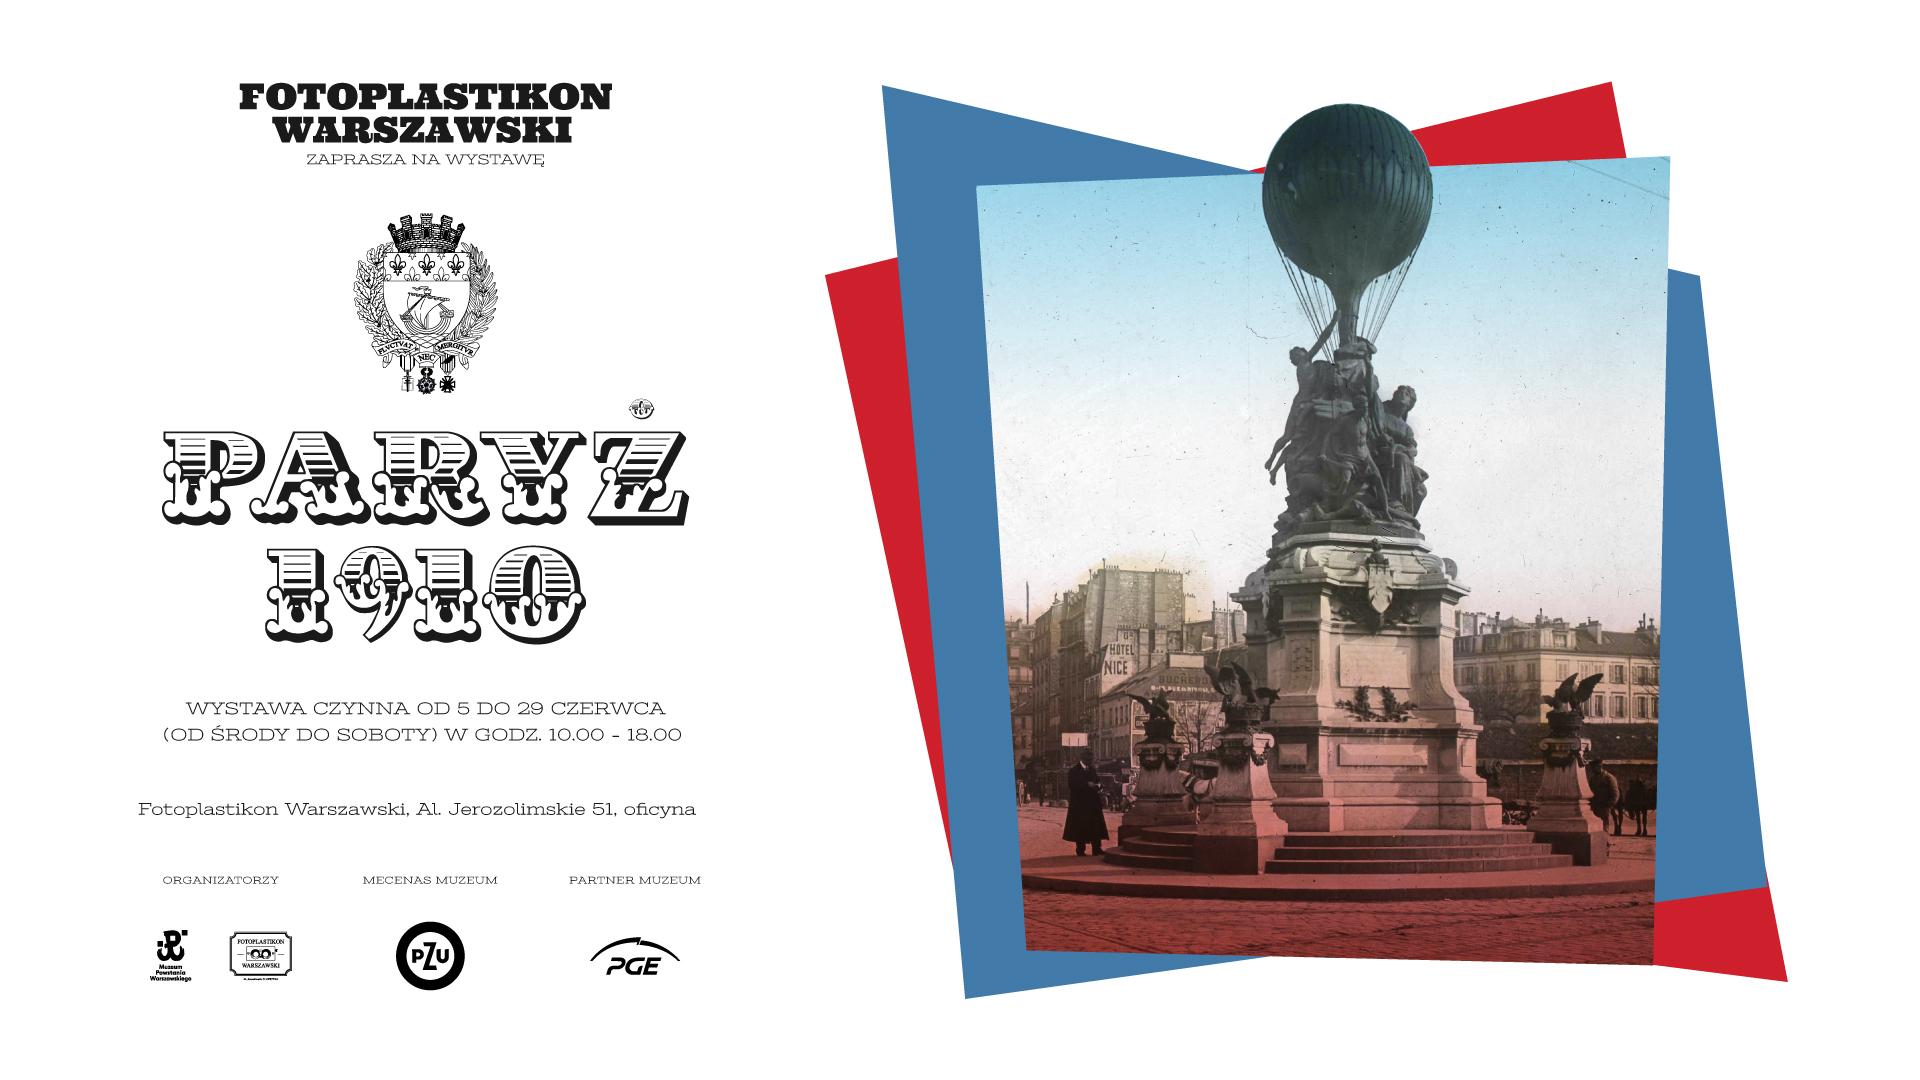 Fotoplastikon-Paryz-2019-06-FB-1920x1080